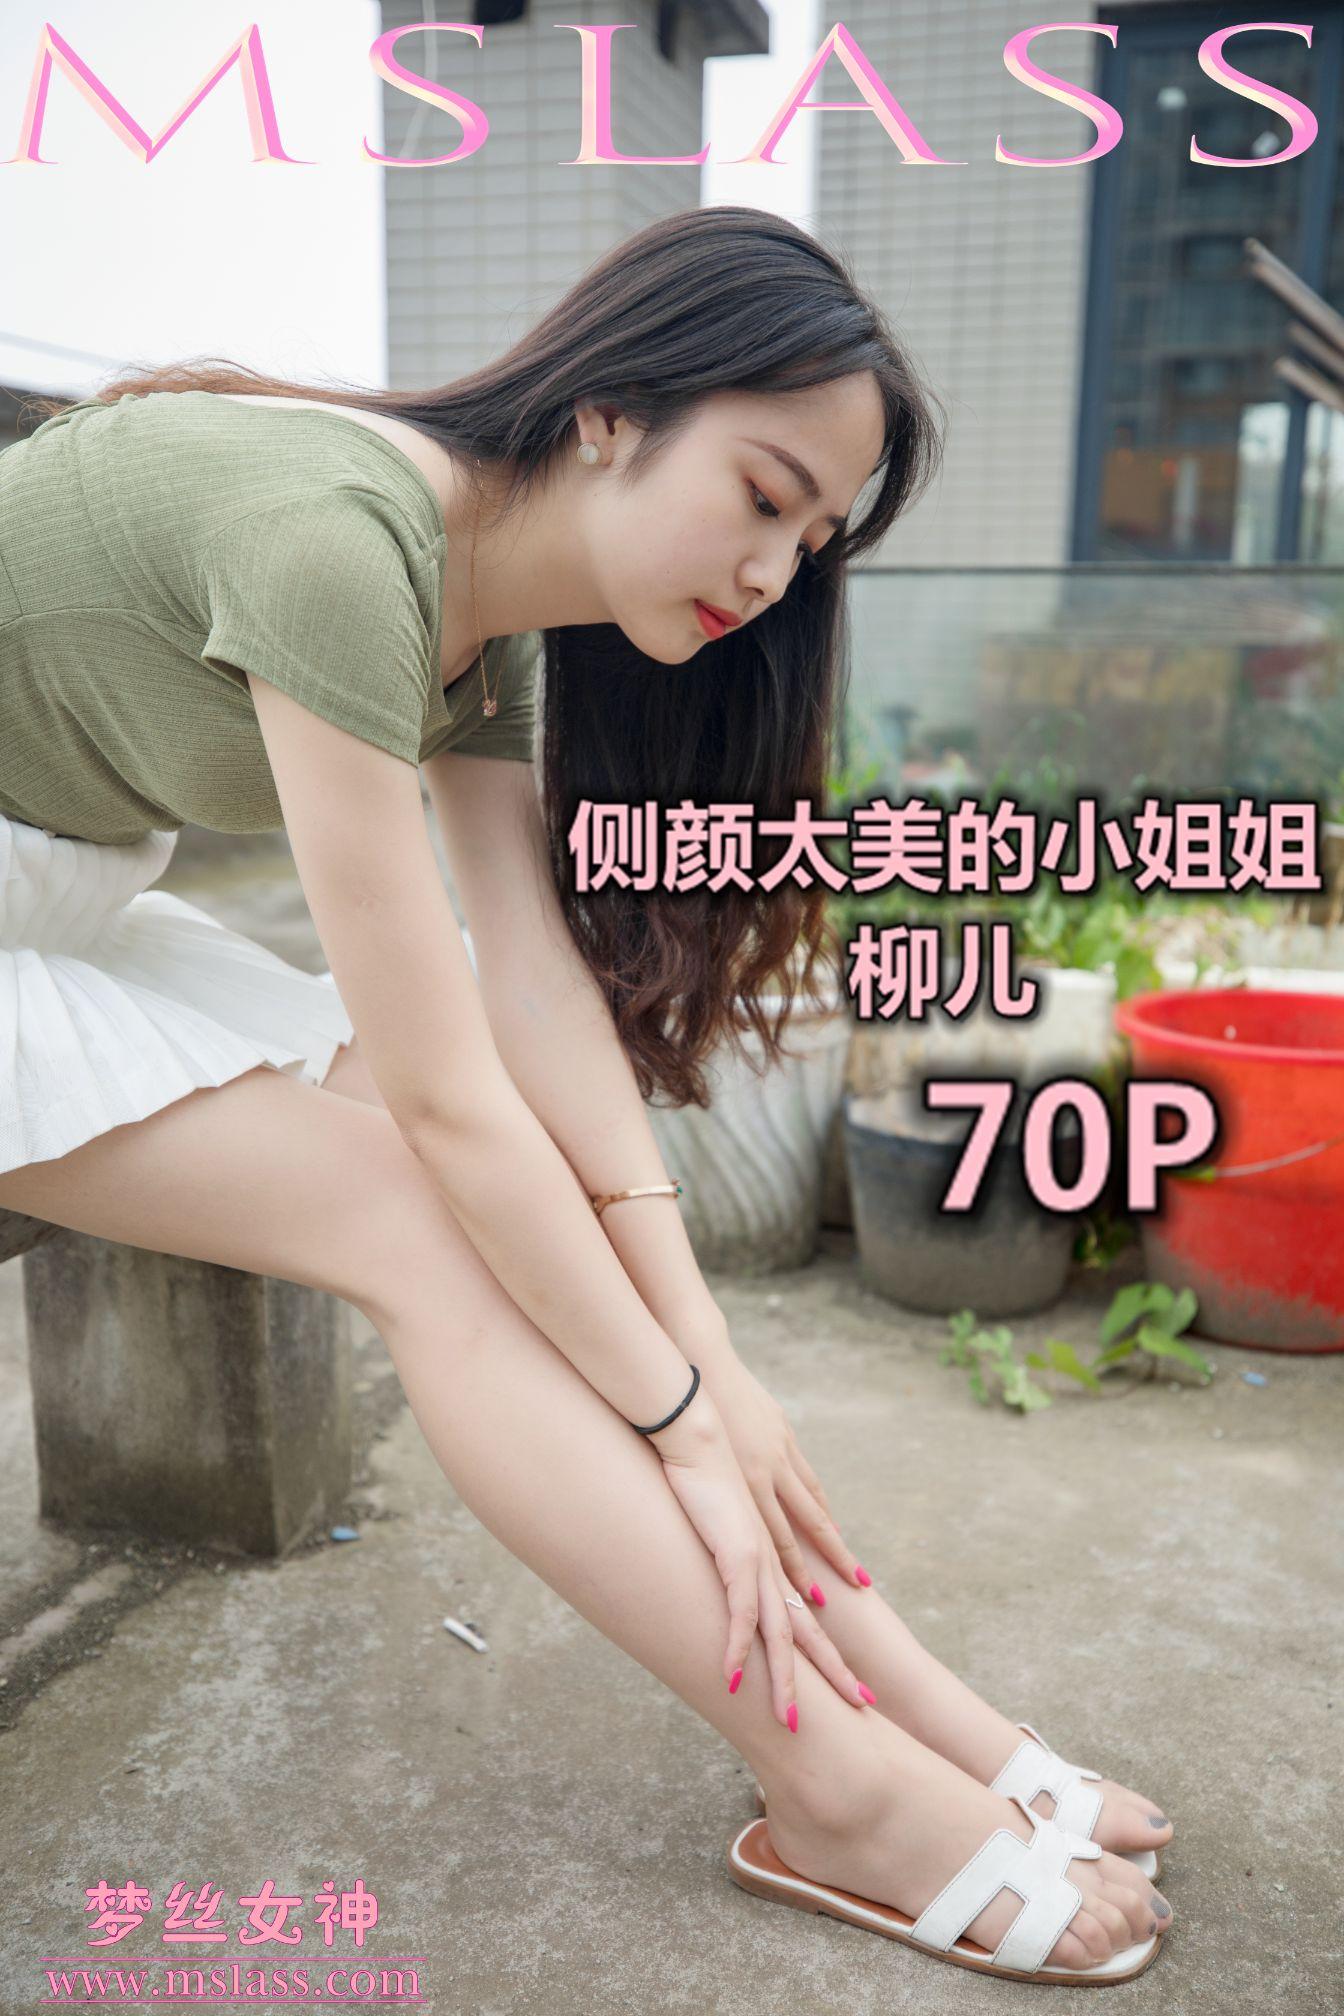 [MSLASS]夢絲女神 - 柳兒(Liǔ er) 側顔太美的小姐姐 [74P] - 貼圖 - 絲襪美腿 -